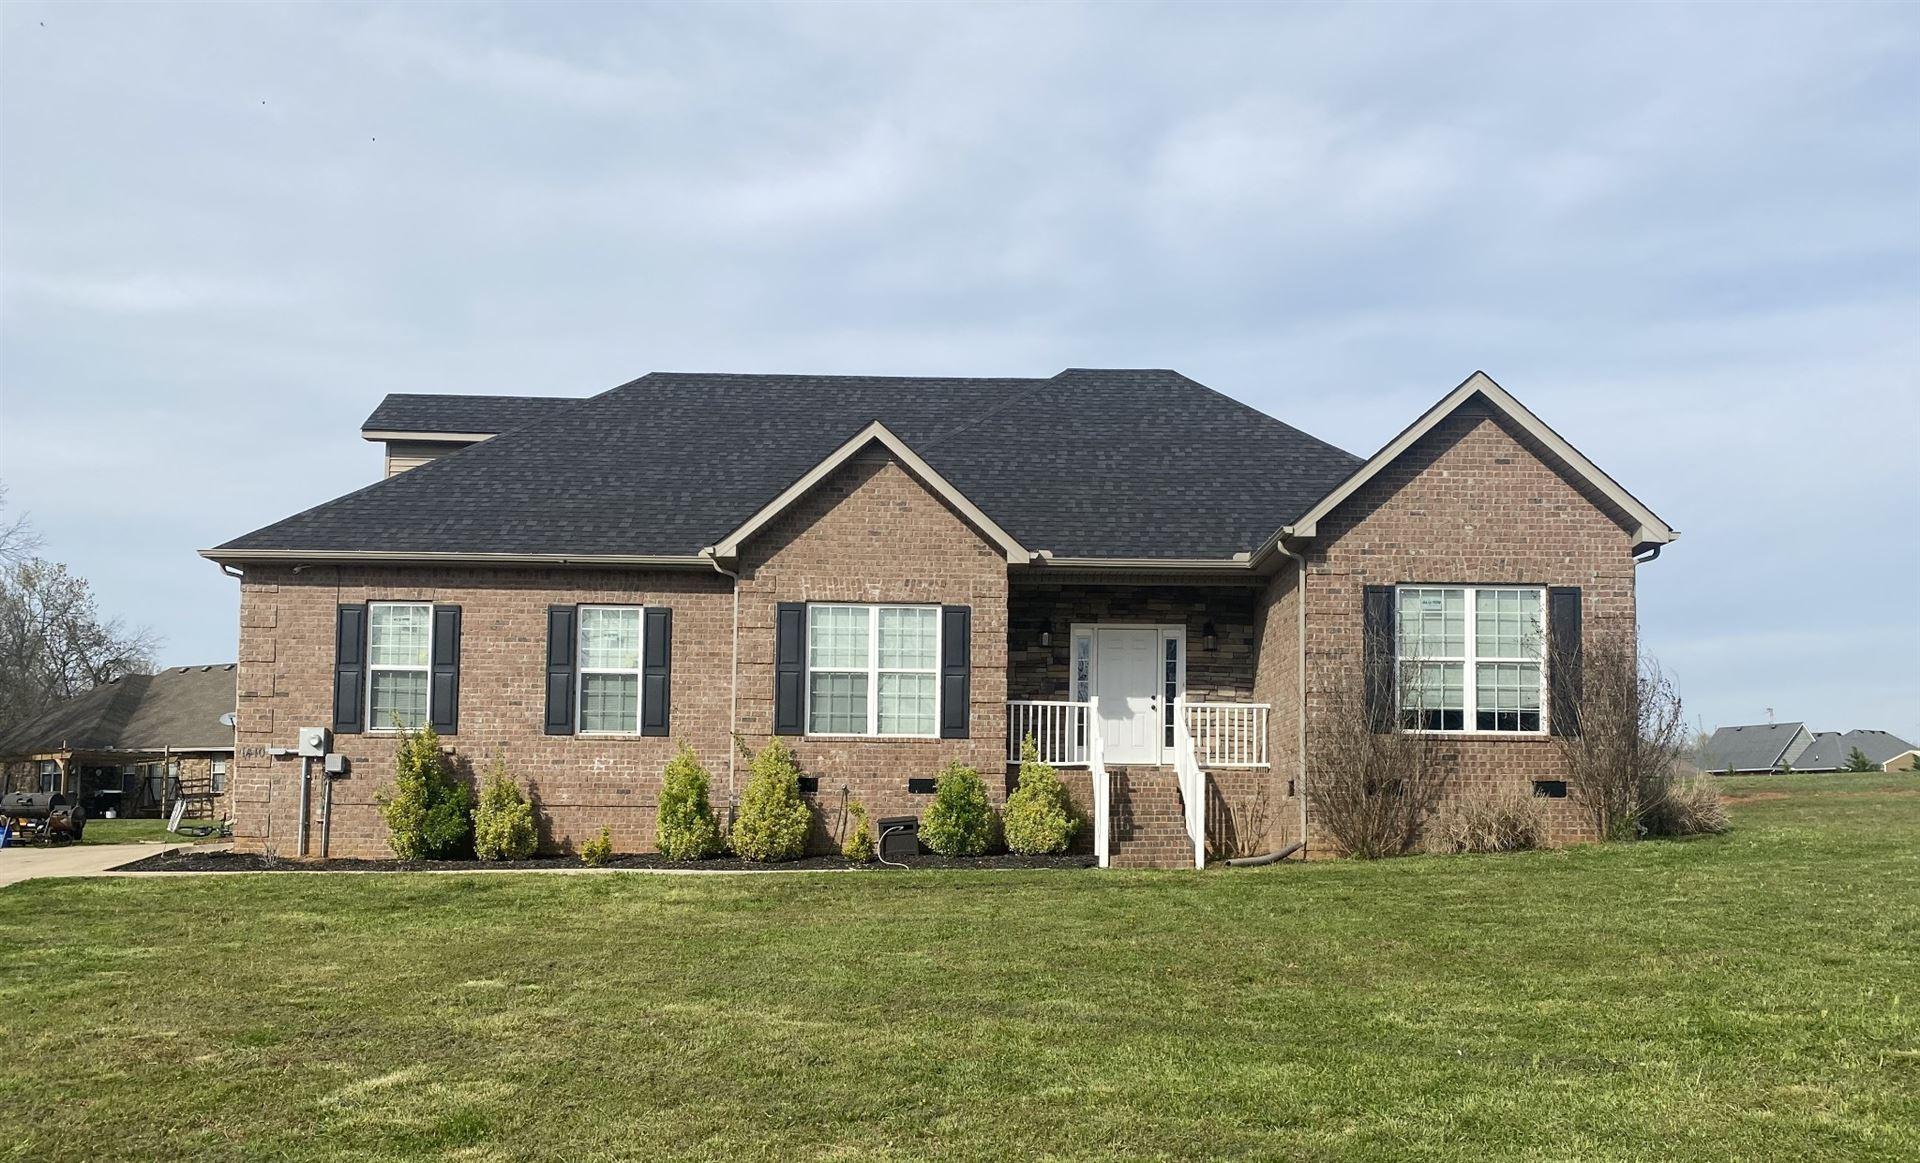 1410 Union St, Shelbyville, TN 37160 - MLS#: 2240531